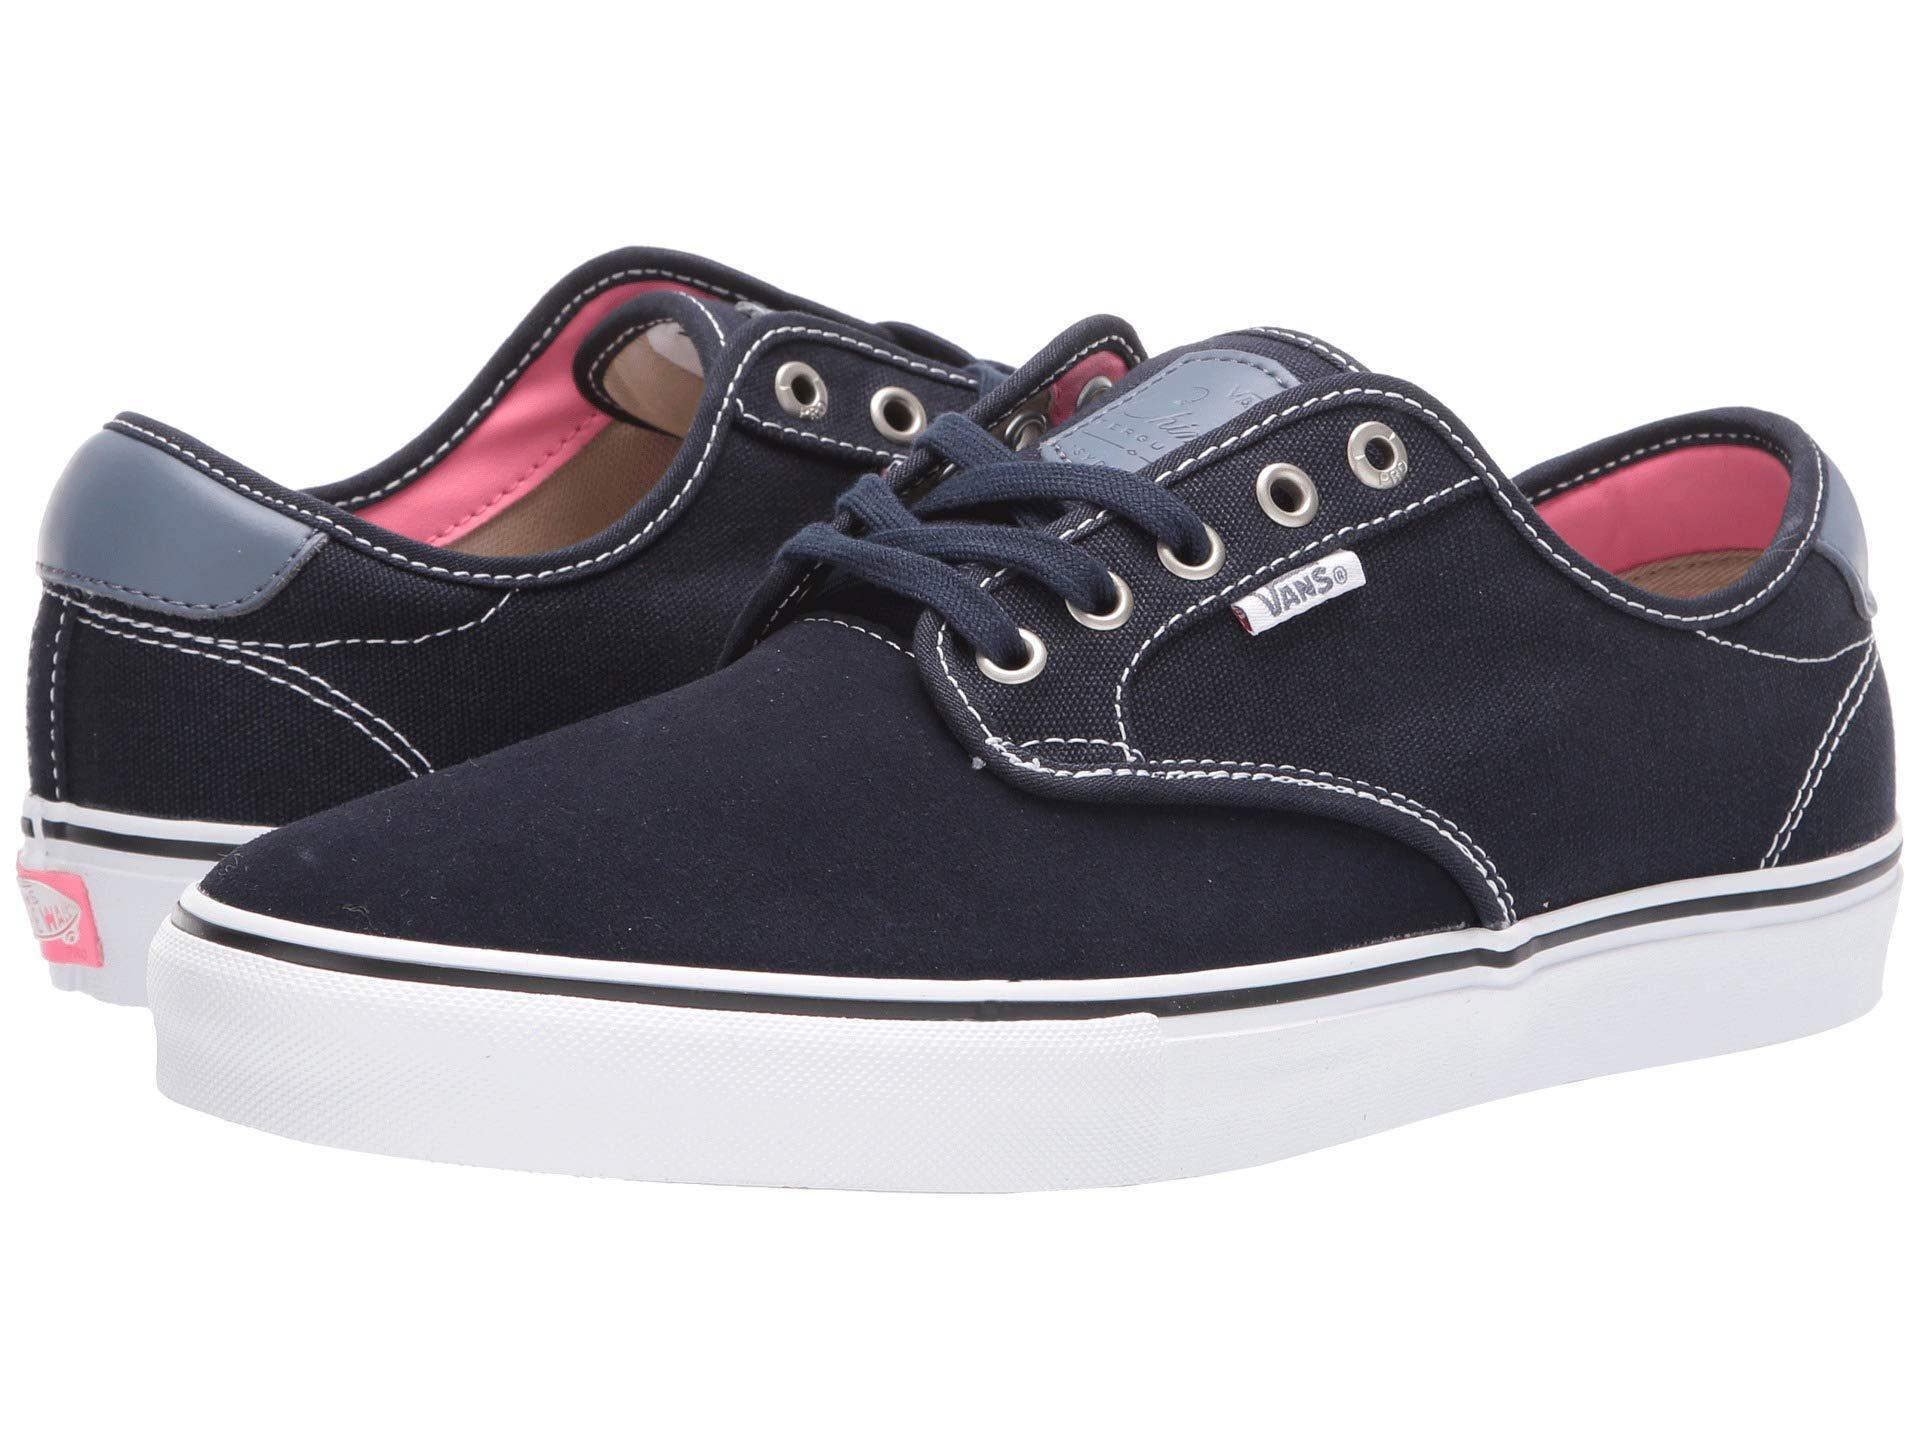 87dfde18d92 Lyst - Vans Chima Ferguson Pro ((twill) Blackout) Men s Skate Shoes ...